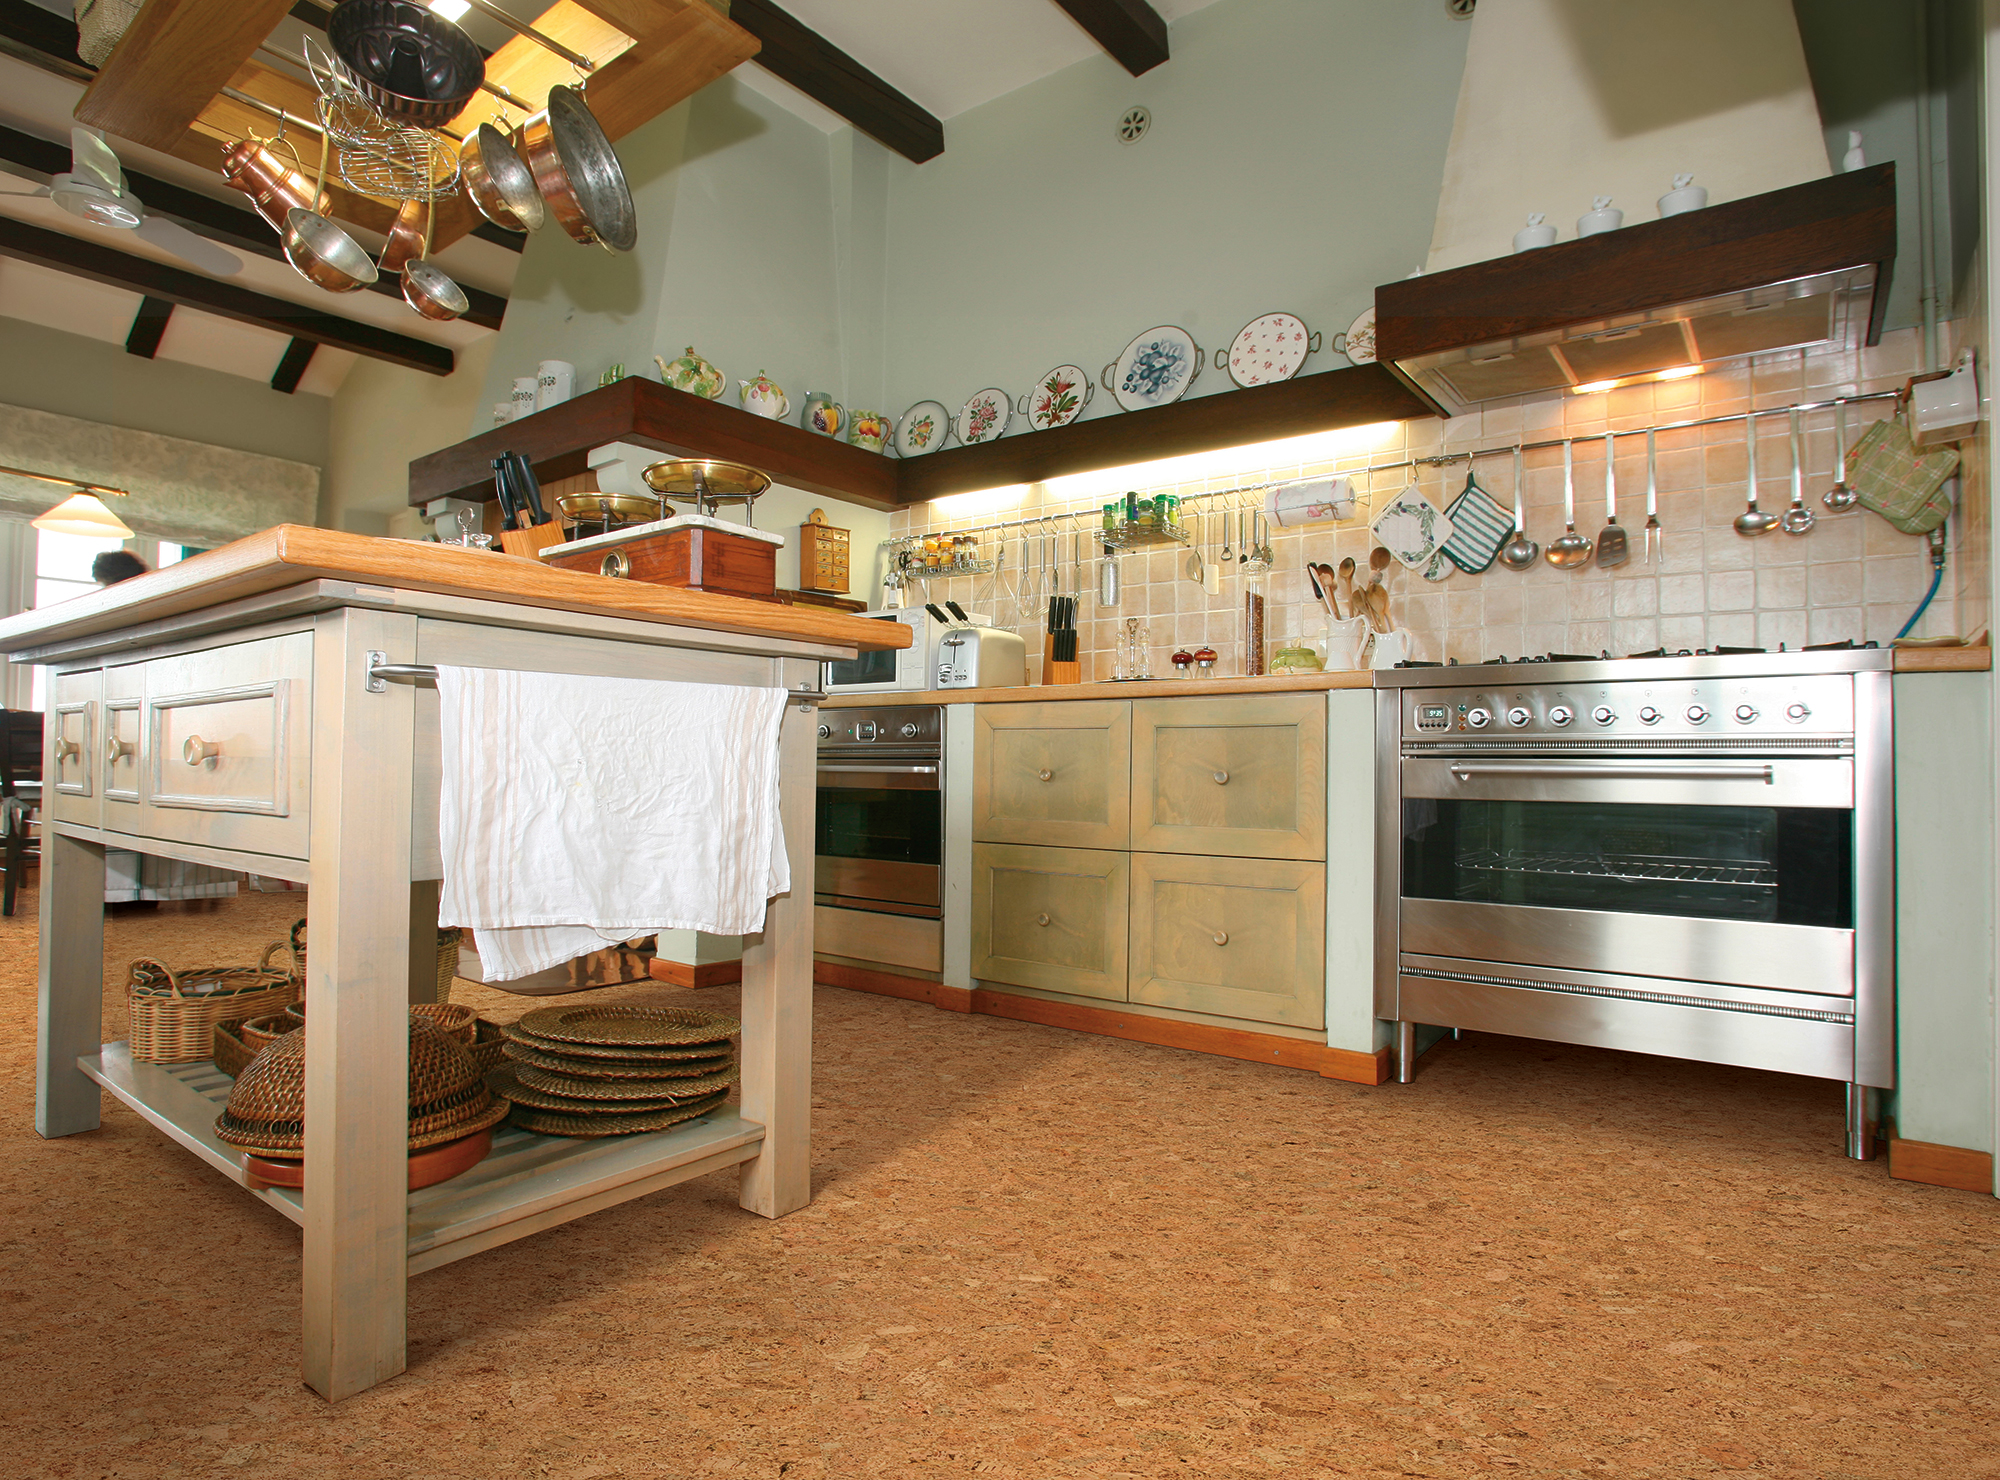 Kitchen Cabinets Baths Carpet Tile Hardwood Furniture Granite Cork 40p3310 Rs Jpg